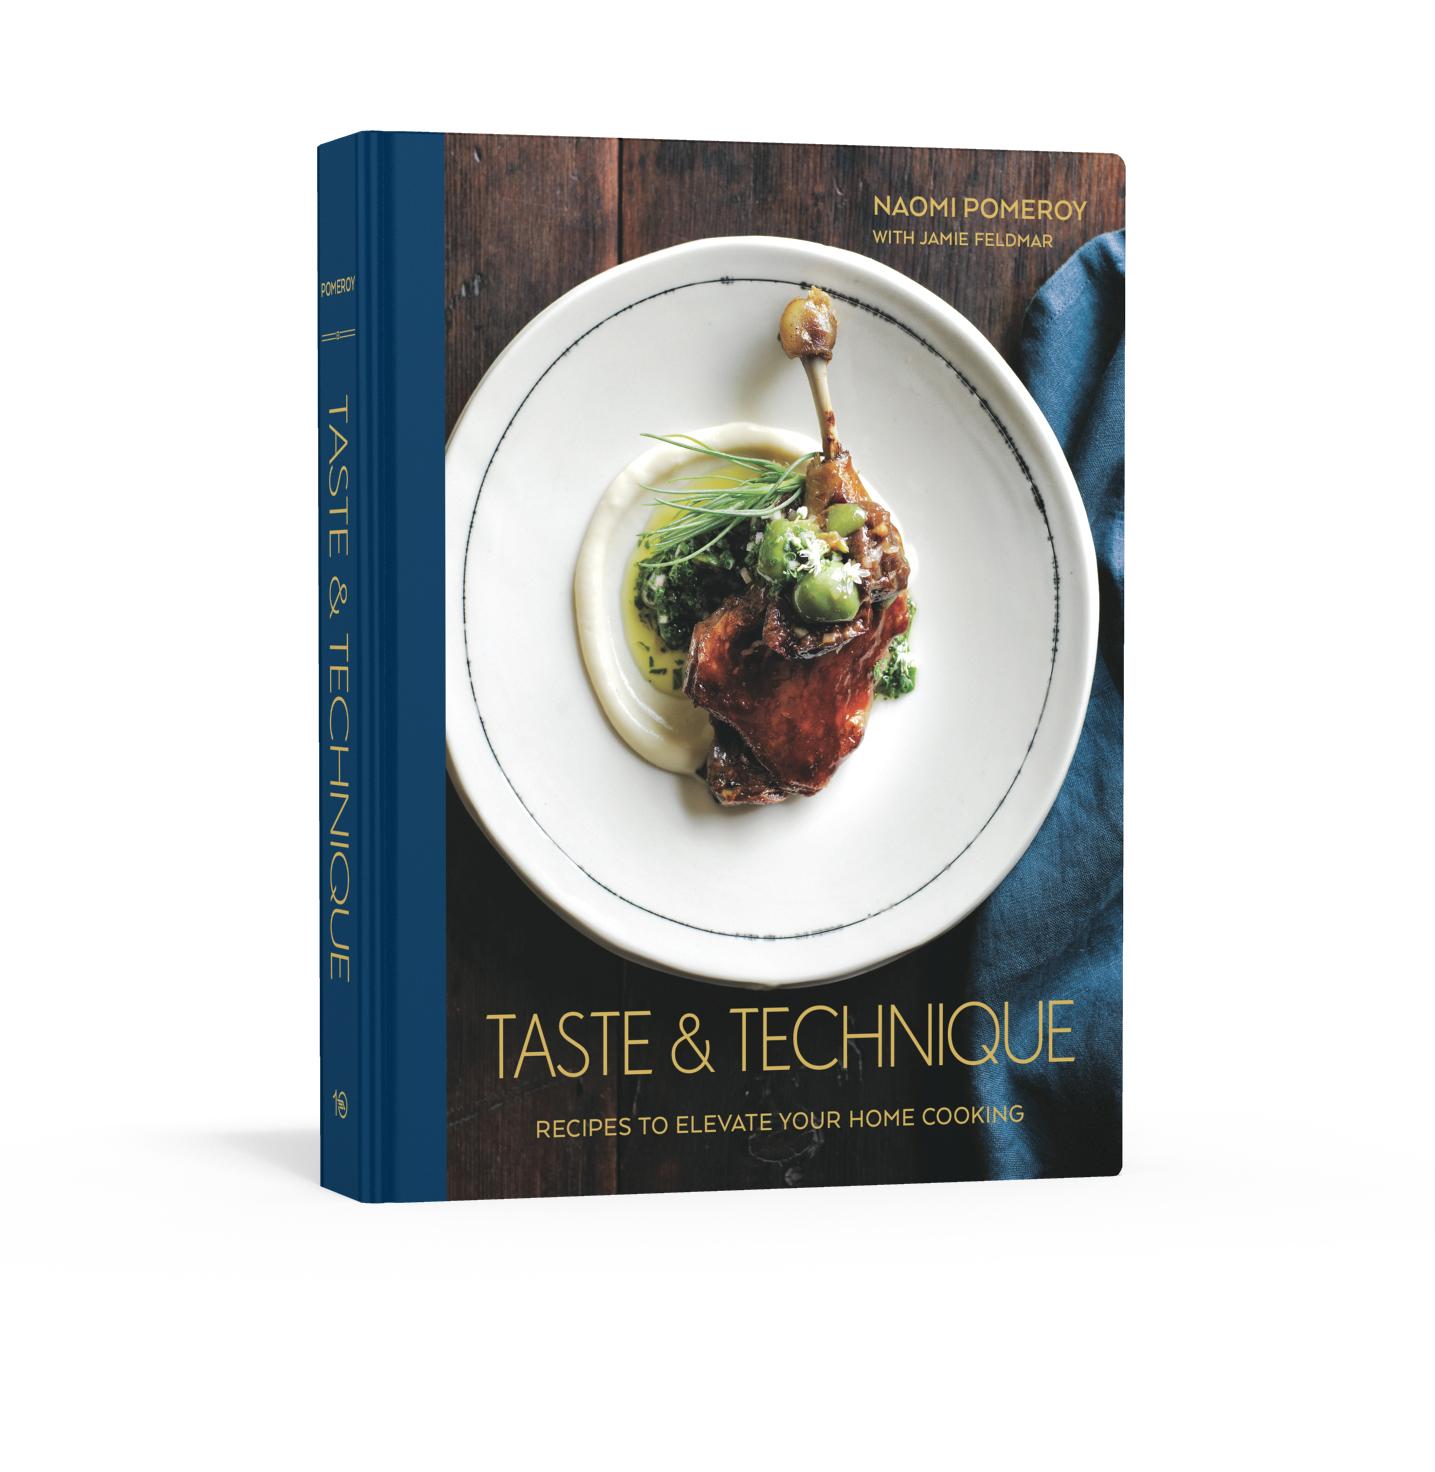 Taste & Technique, by Beast's Naomi Pomeroy